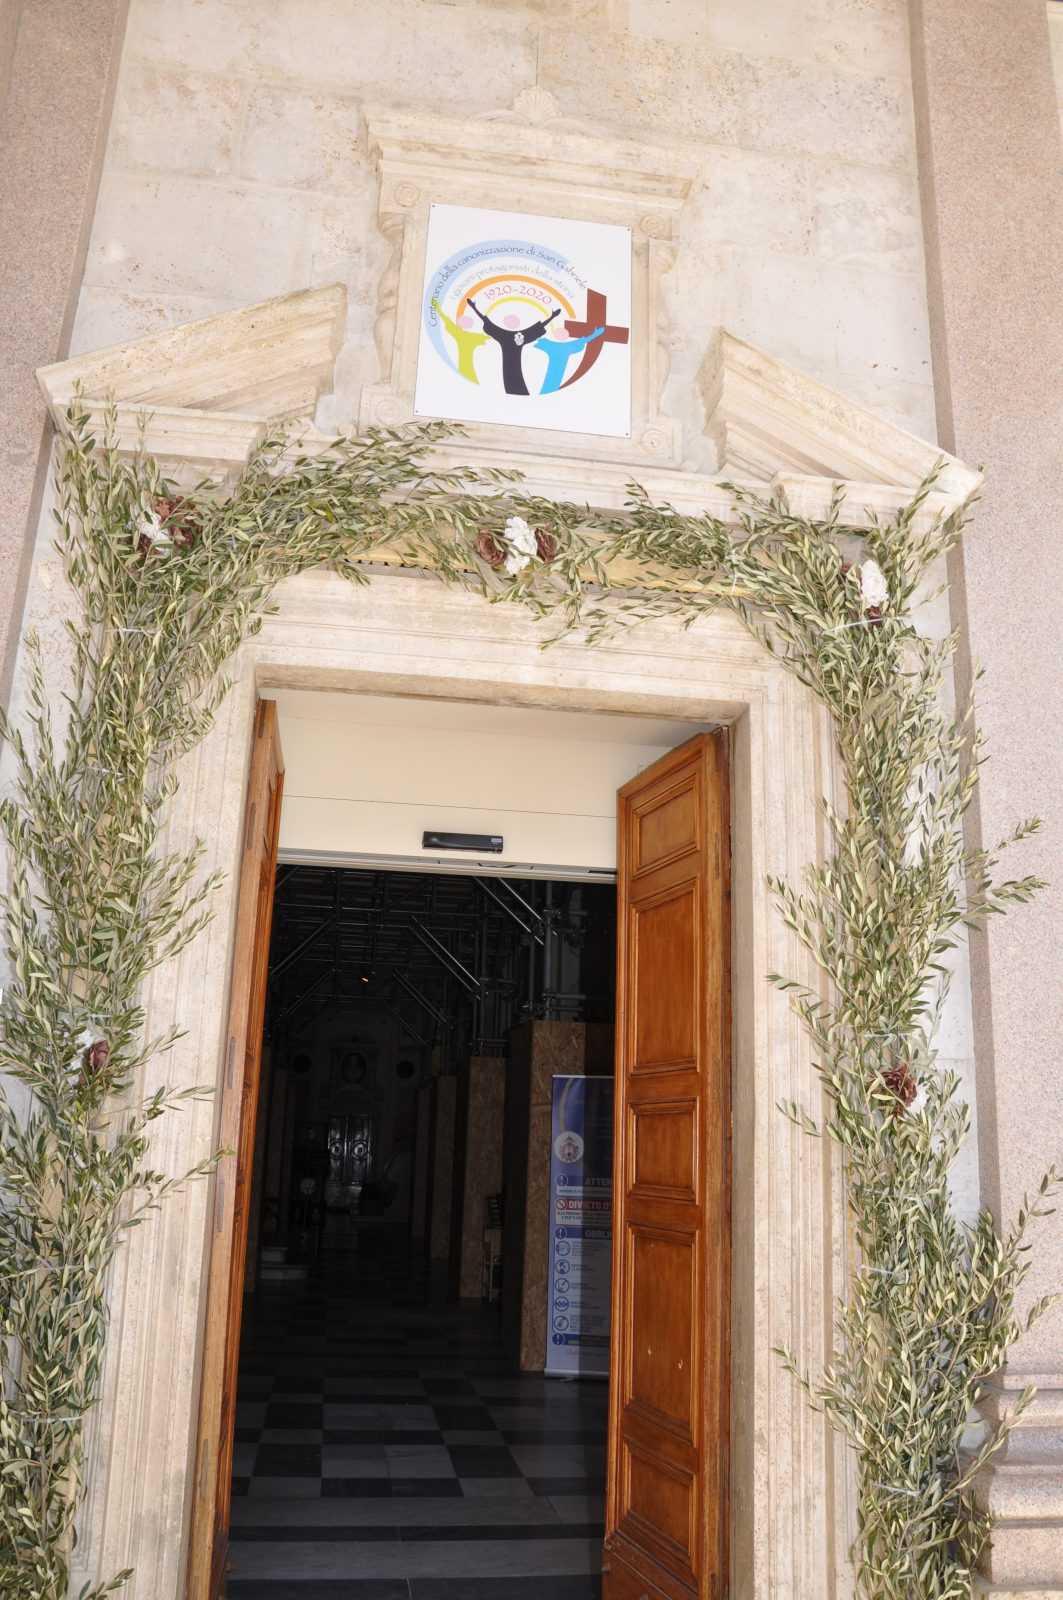 Festività pasquali al santuario di San Gabriele